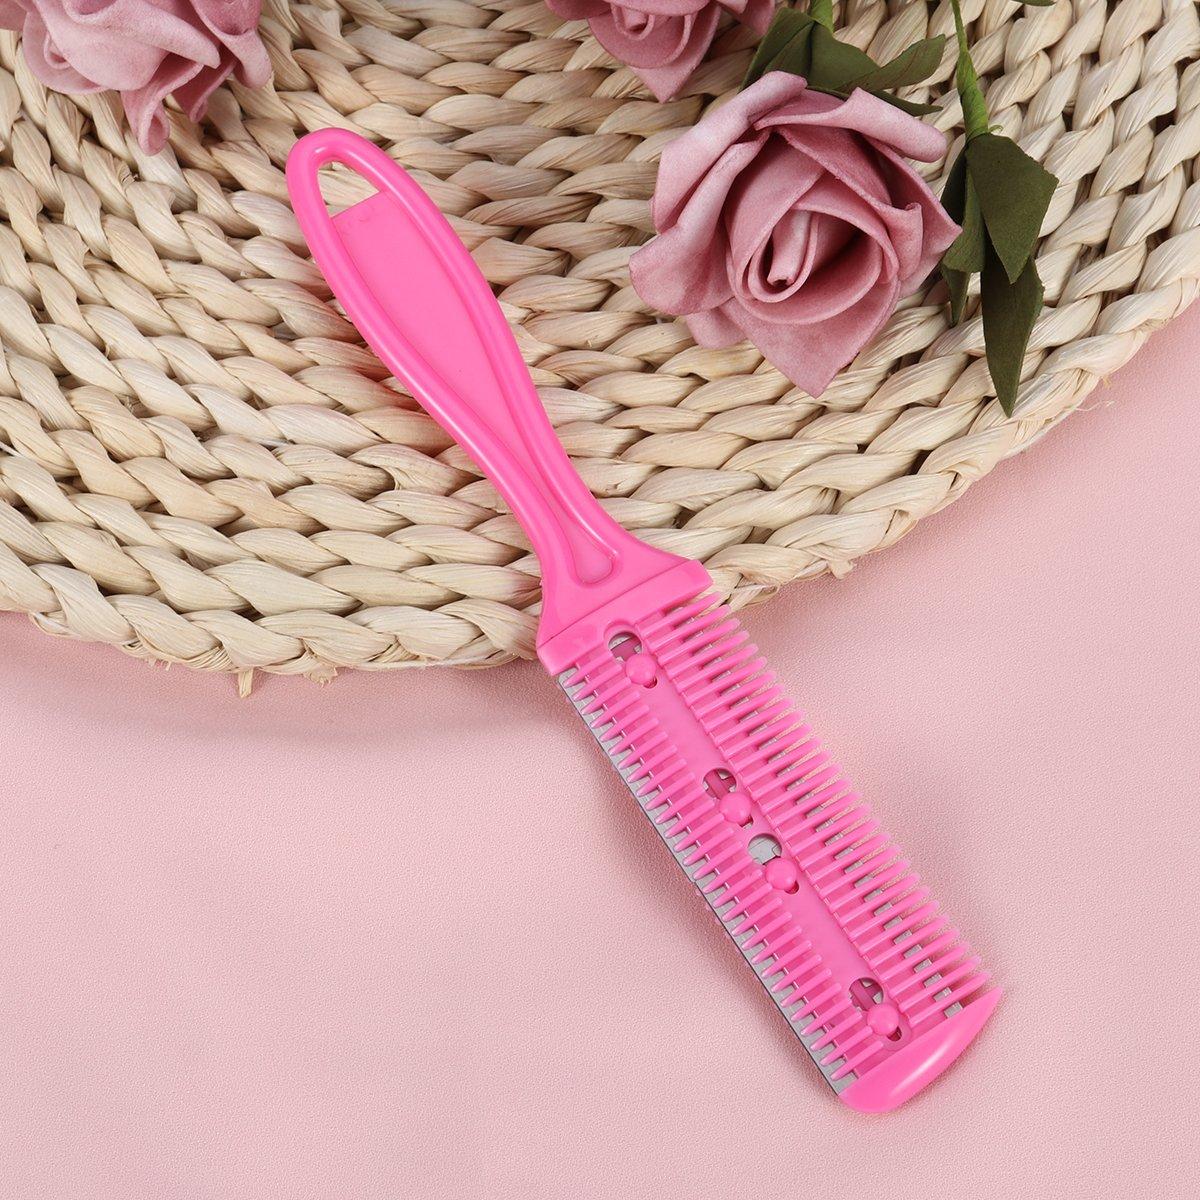 Frcolor Peine de corte de pelo, peine de recorte de pelo lateral doble Peine de acero inoxidable, paquete de 3 (color de rosa rojo): Amazon.es: Belleza